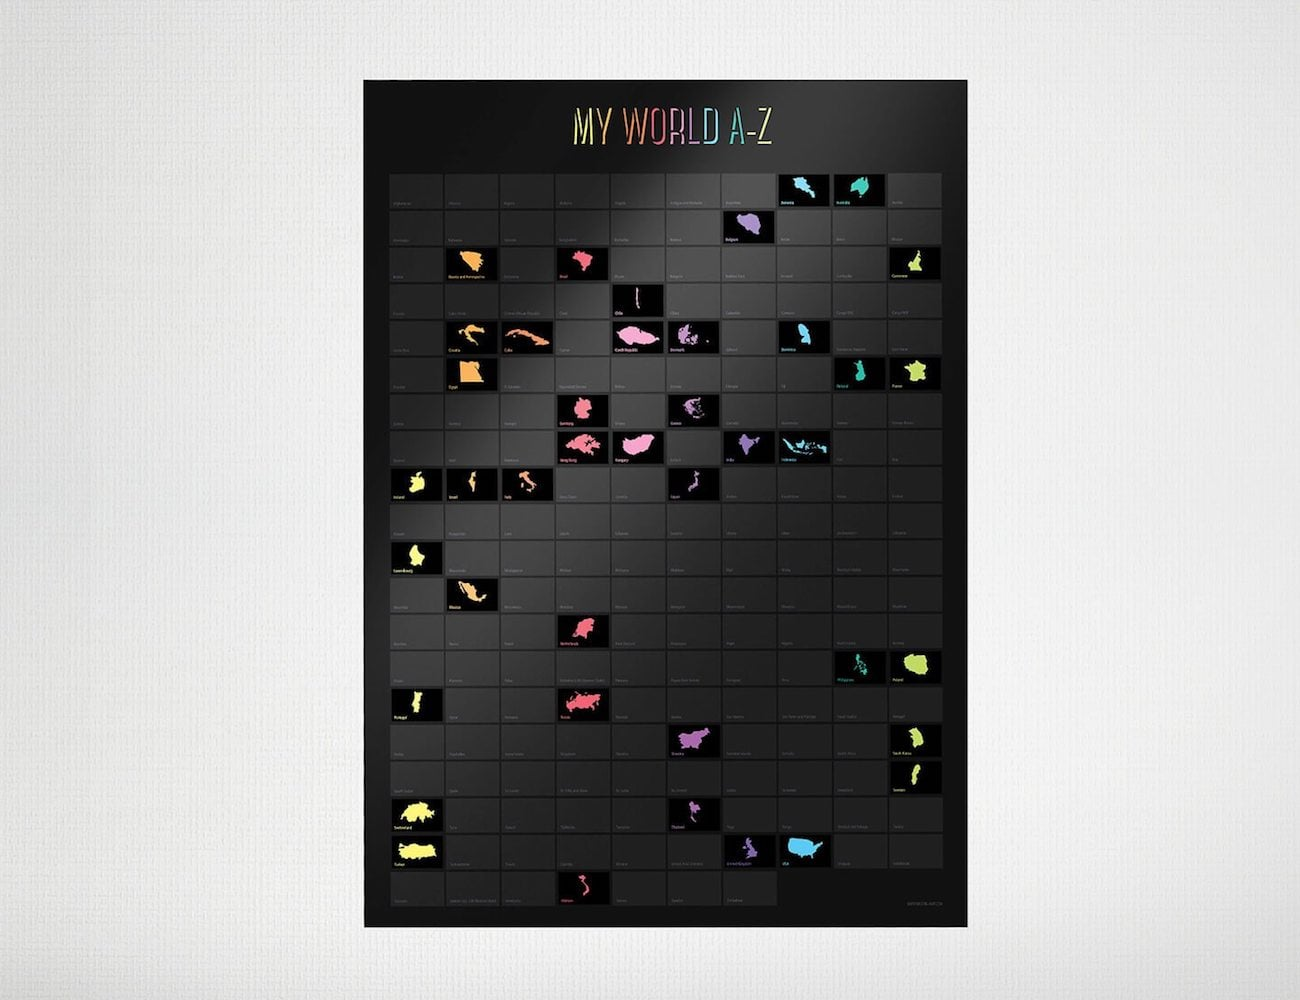 Awesome Maps World A-Z Scratch Map